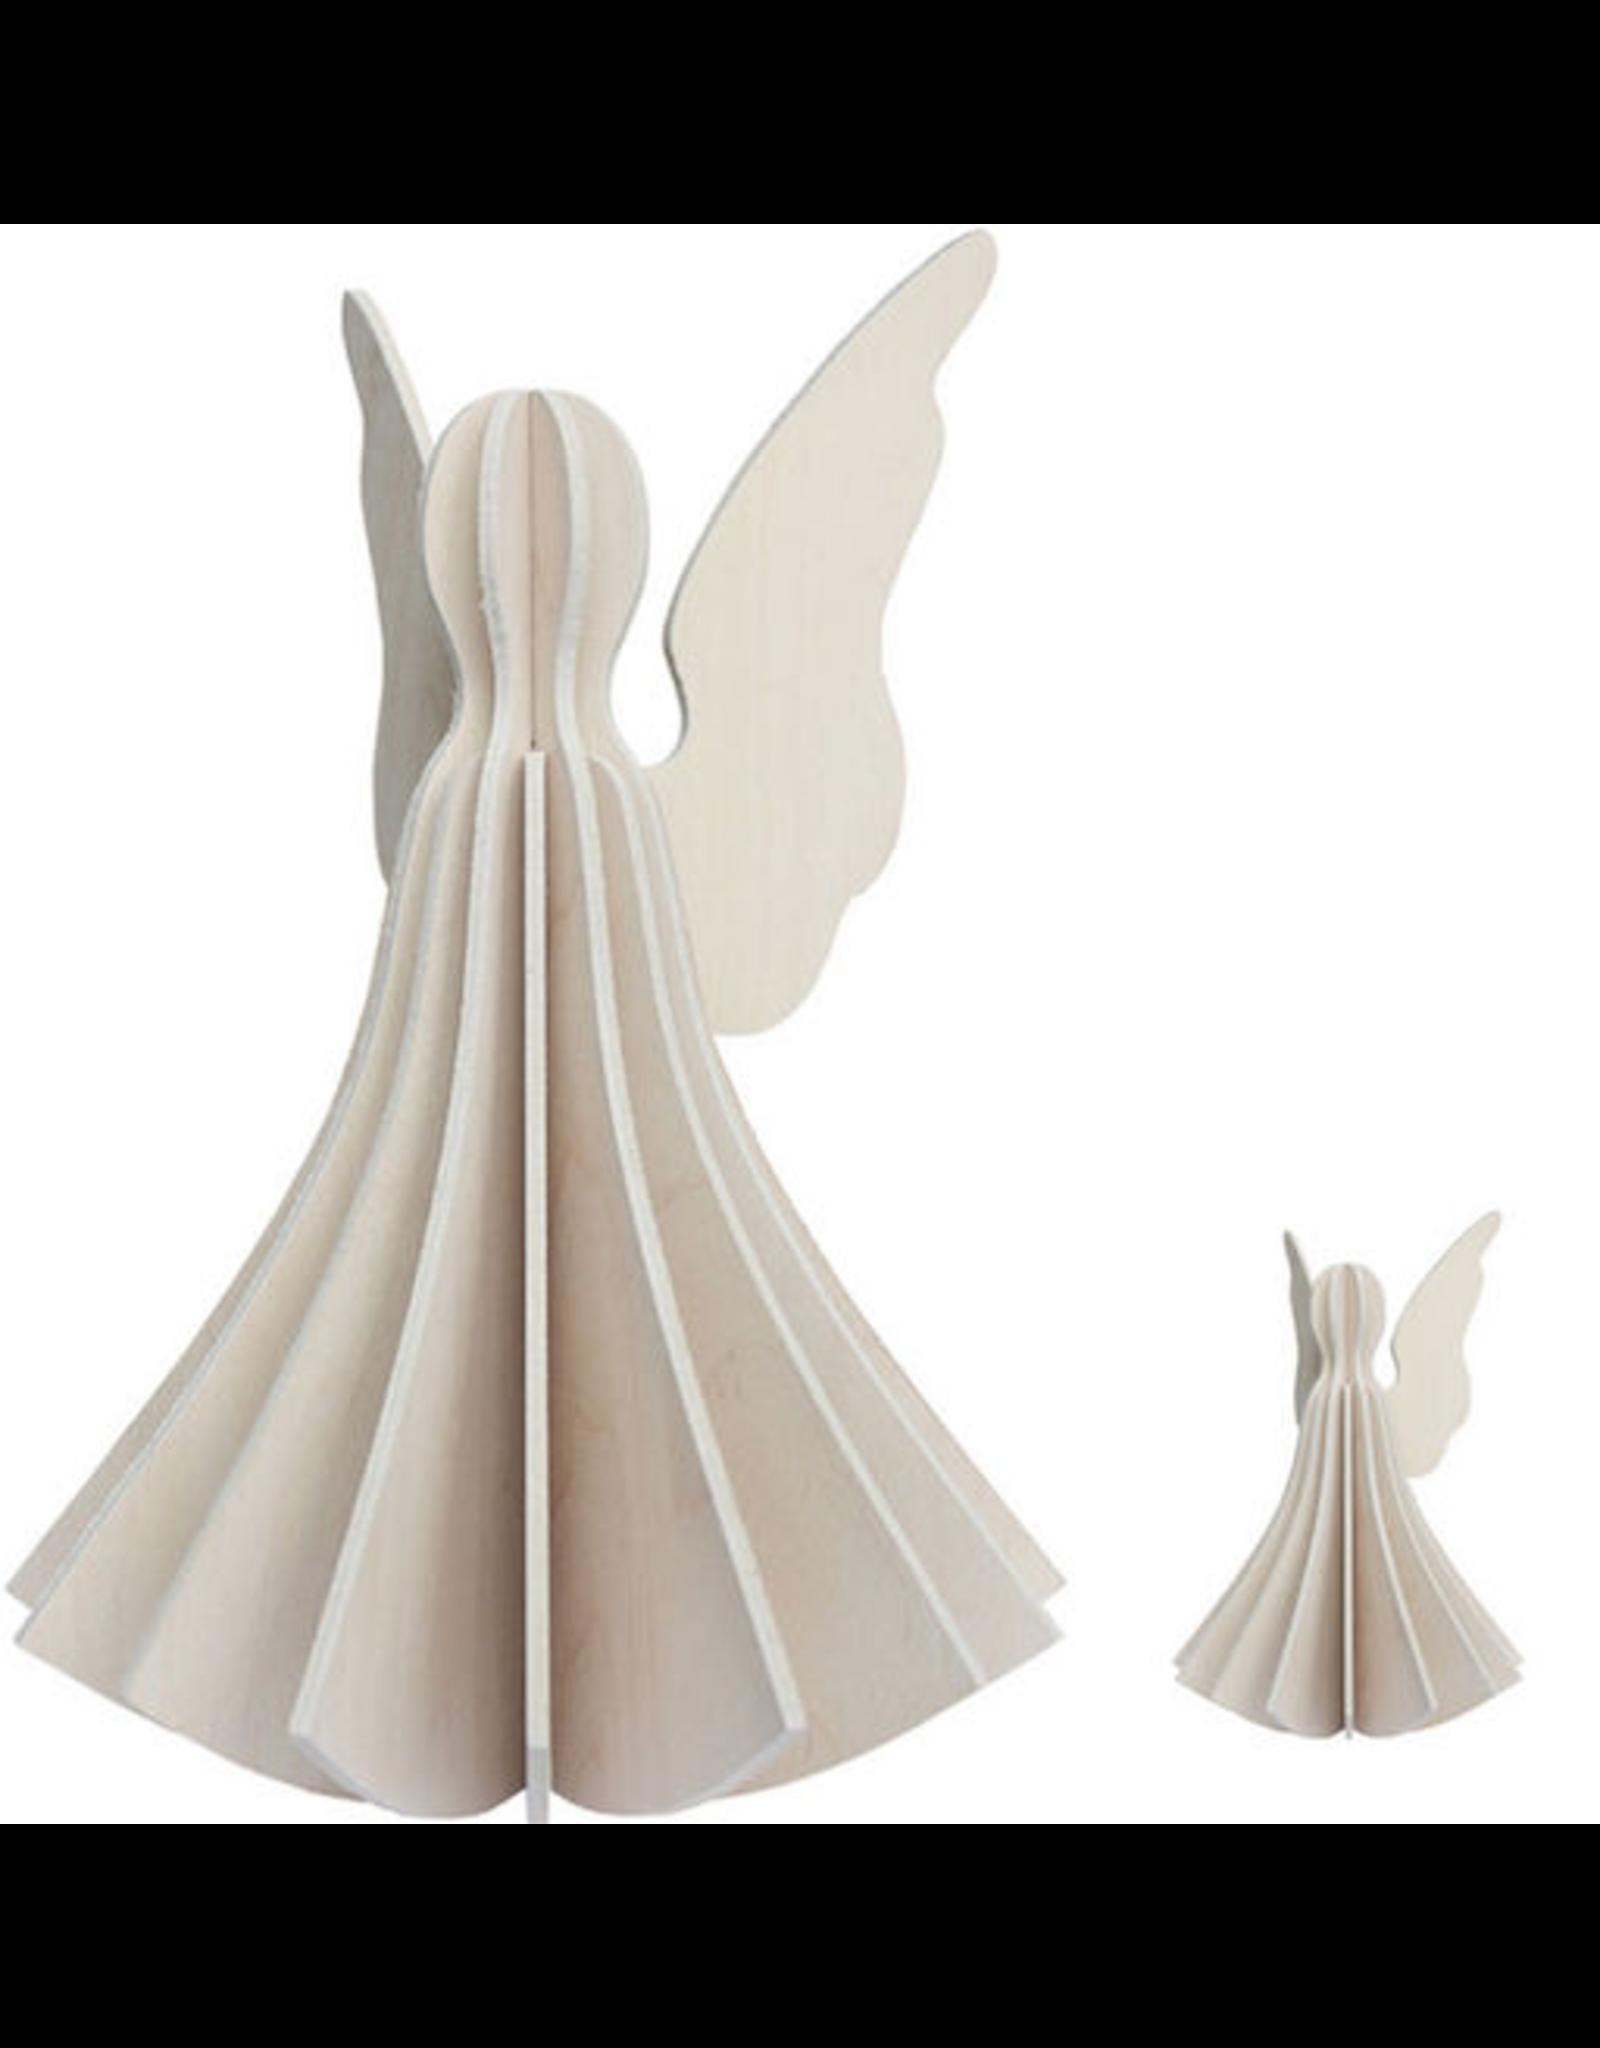 LOVI ANGEL SHAPED ORNAMENT IN WHITE